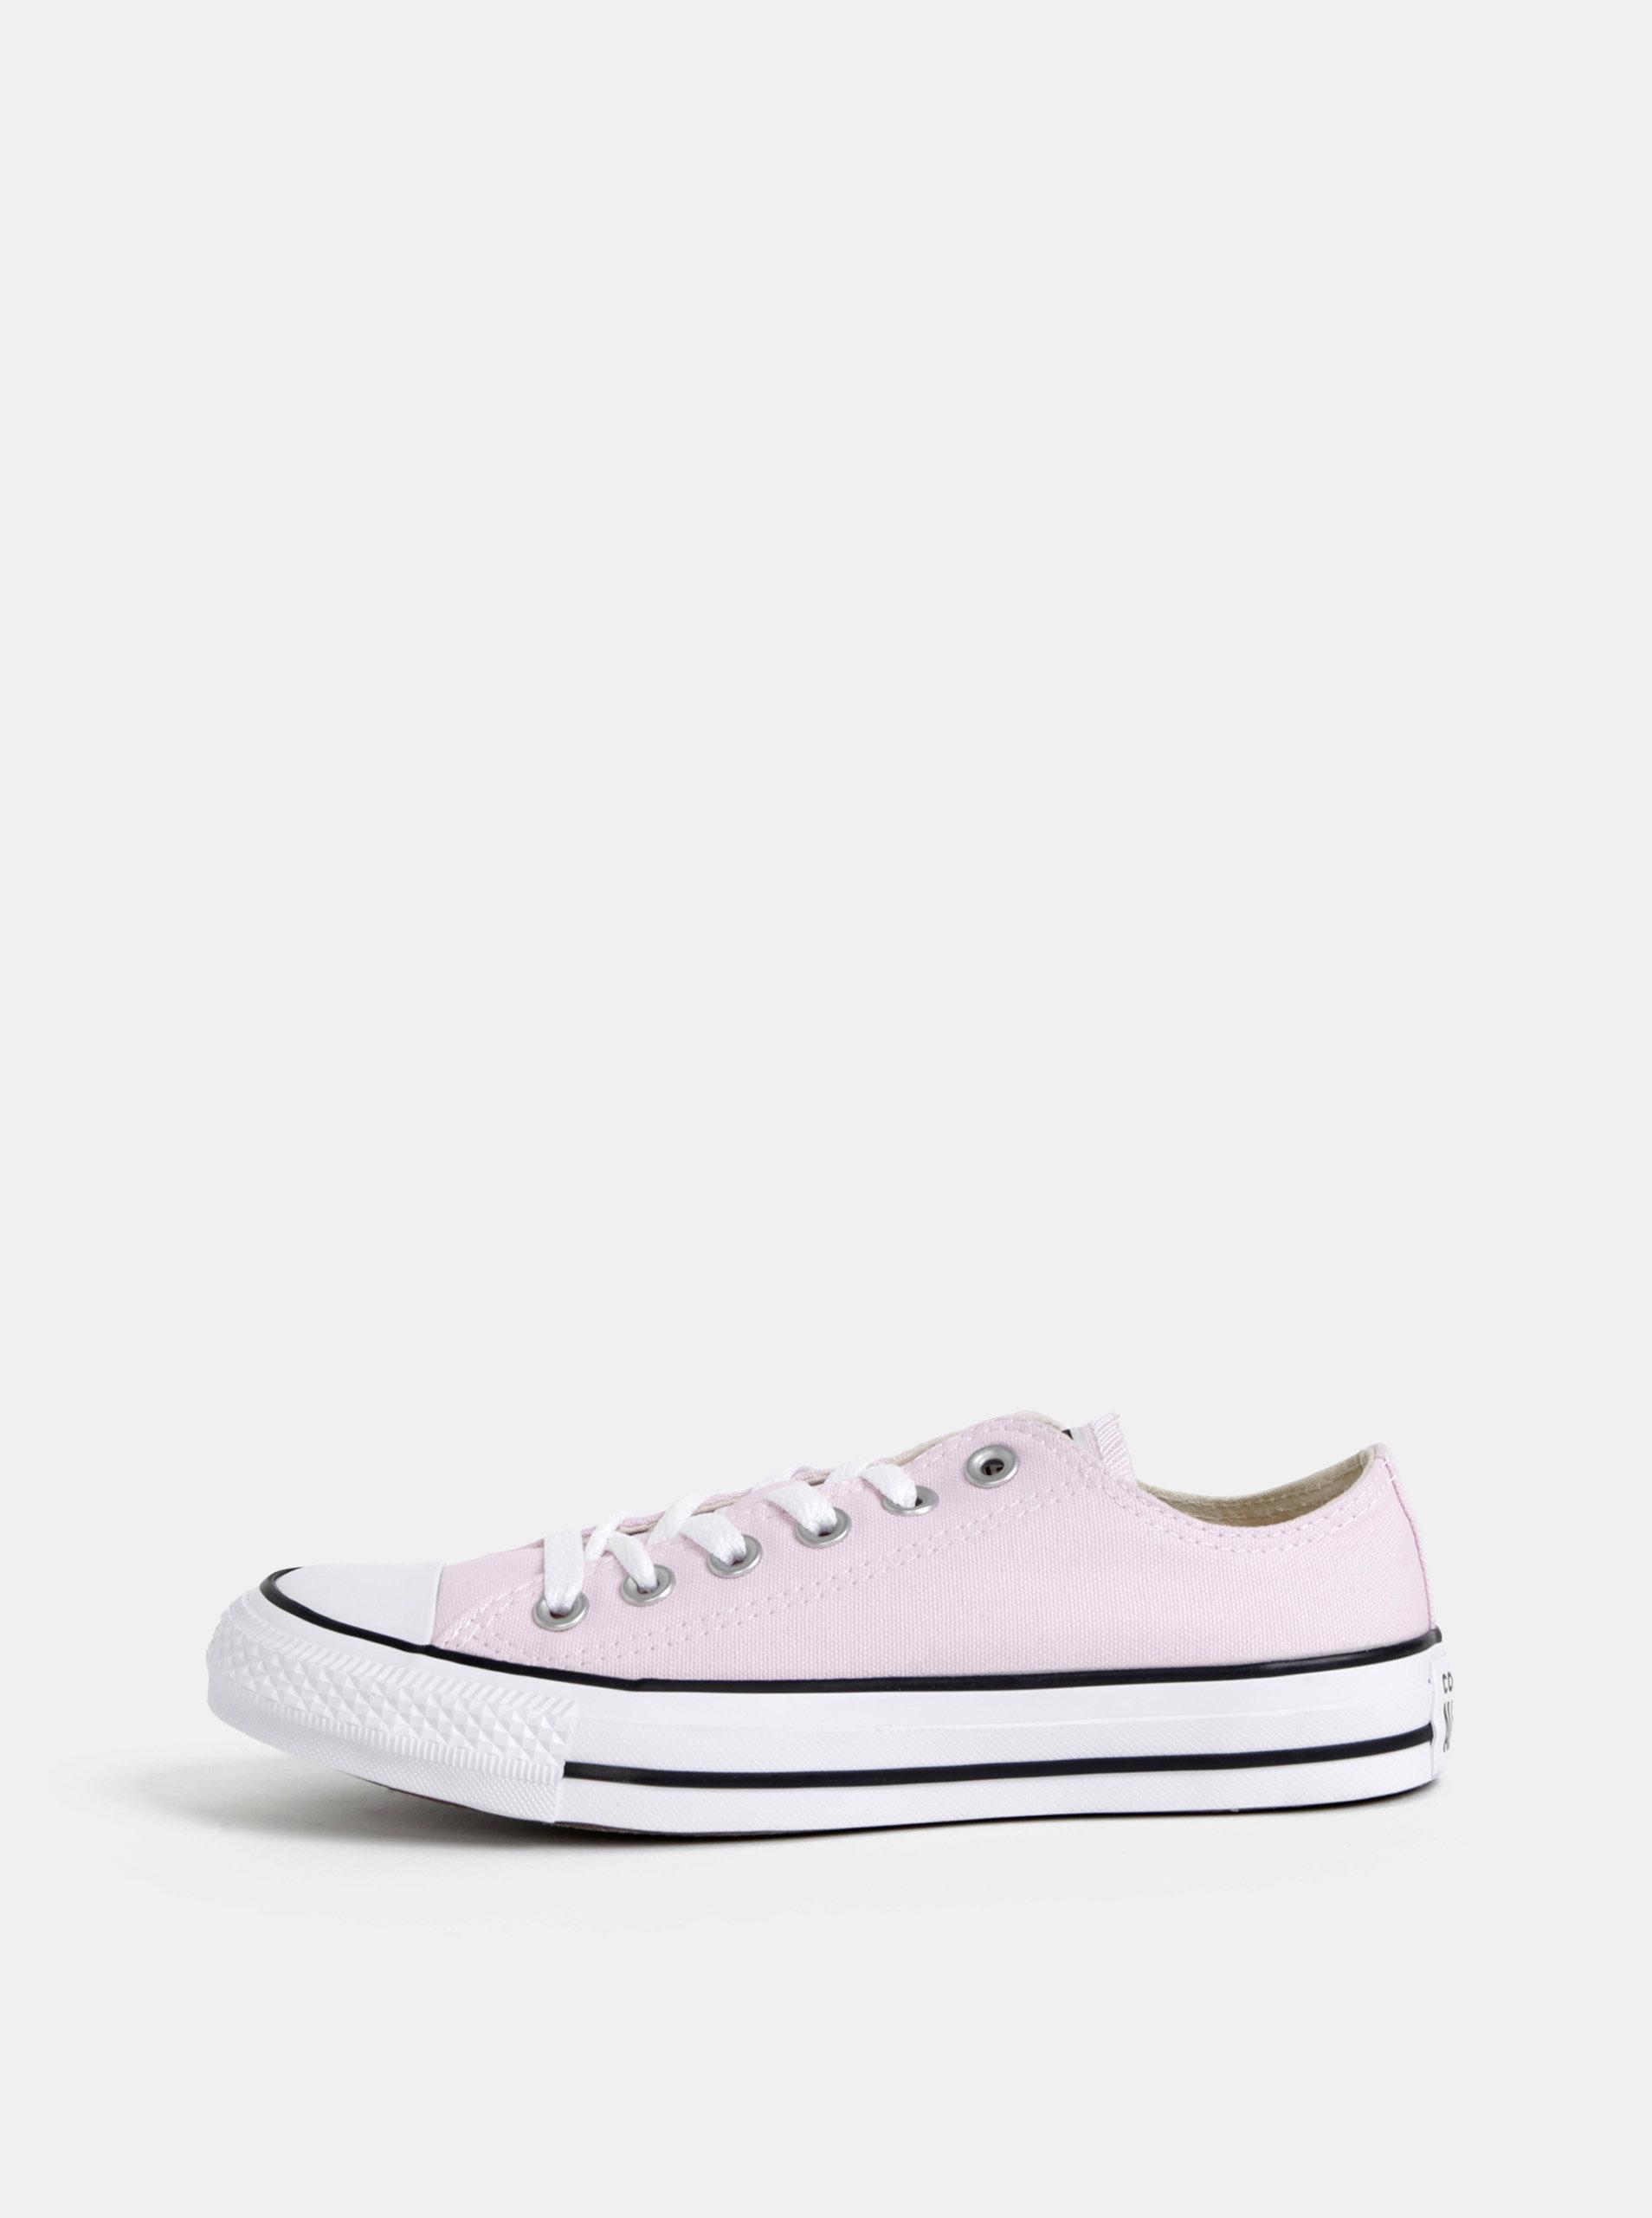 55c32cdc0506a Světle růžové dámské tenisky Converse Chuck Taylor All Star | ZOOT.cz